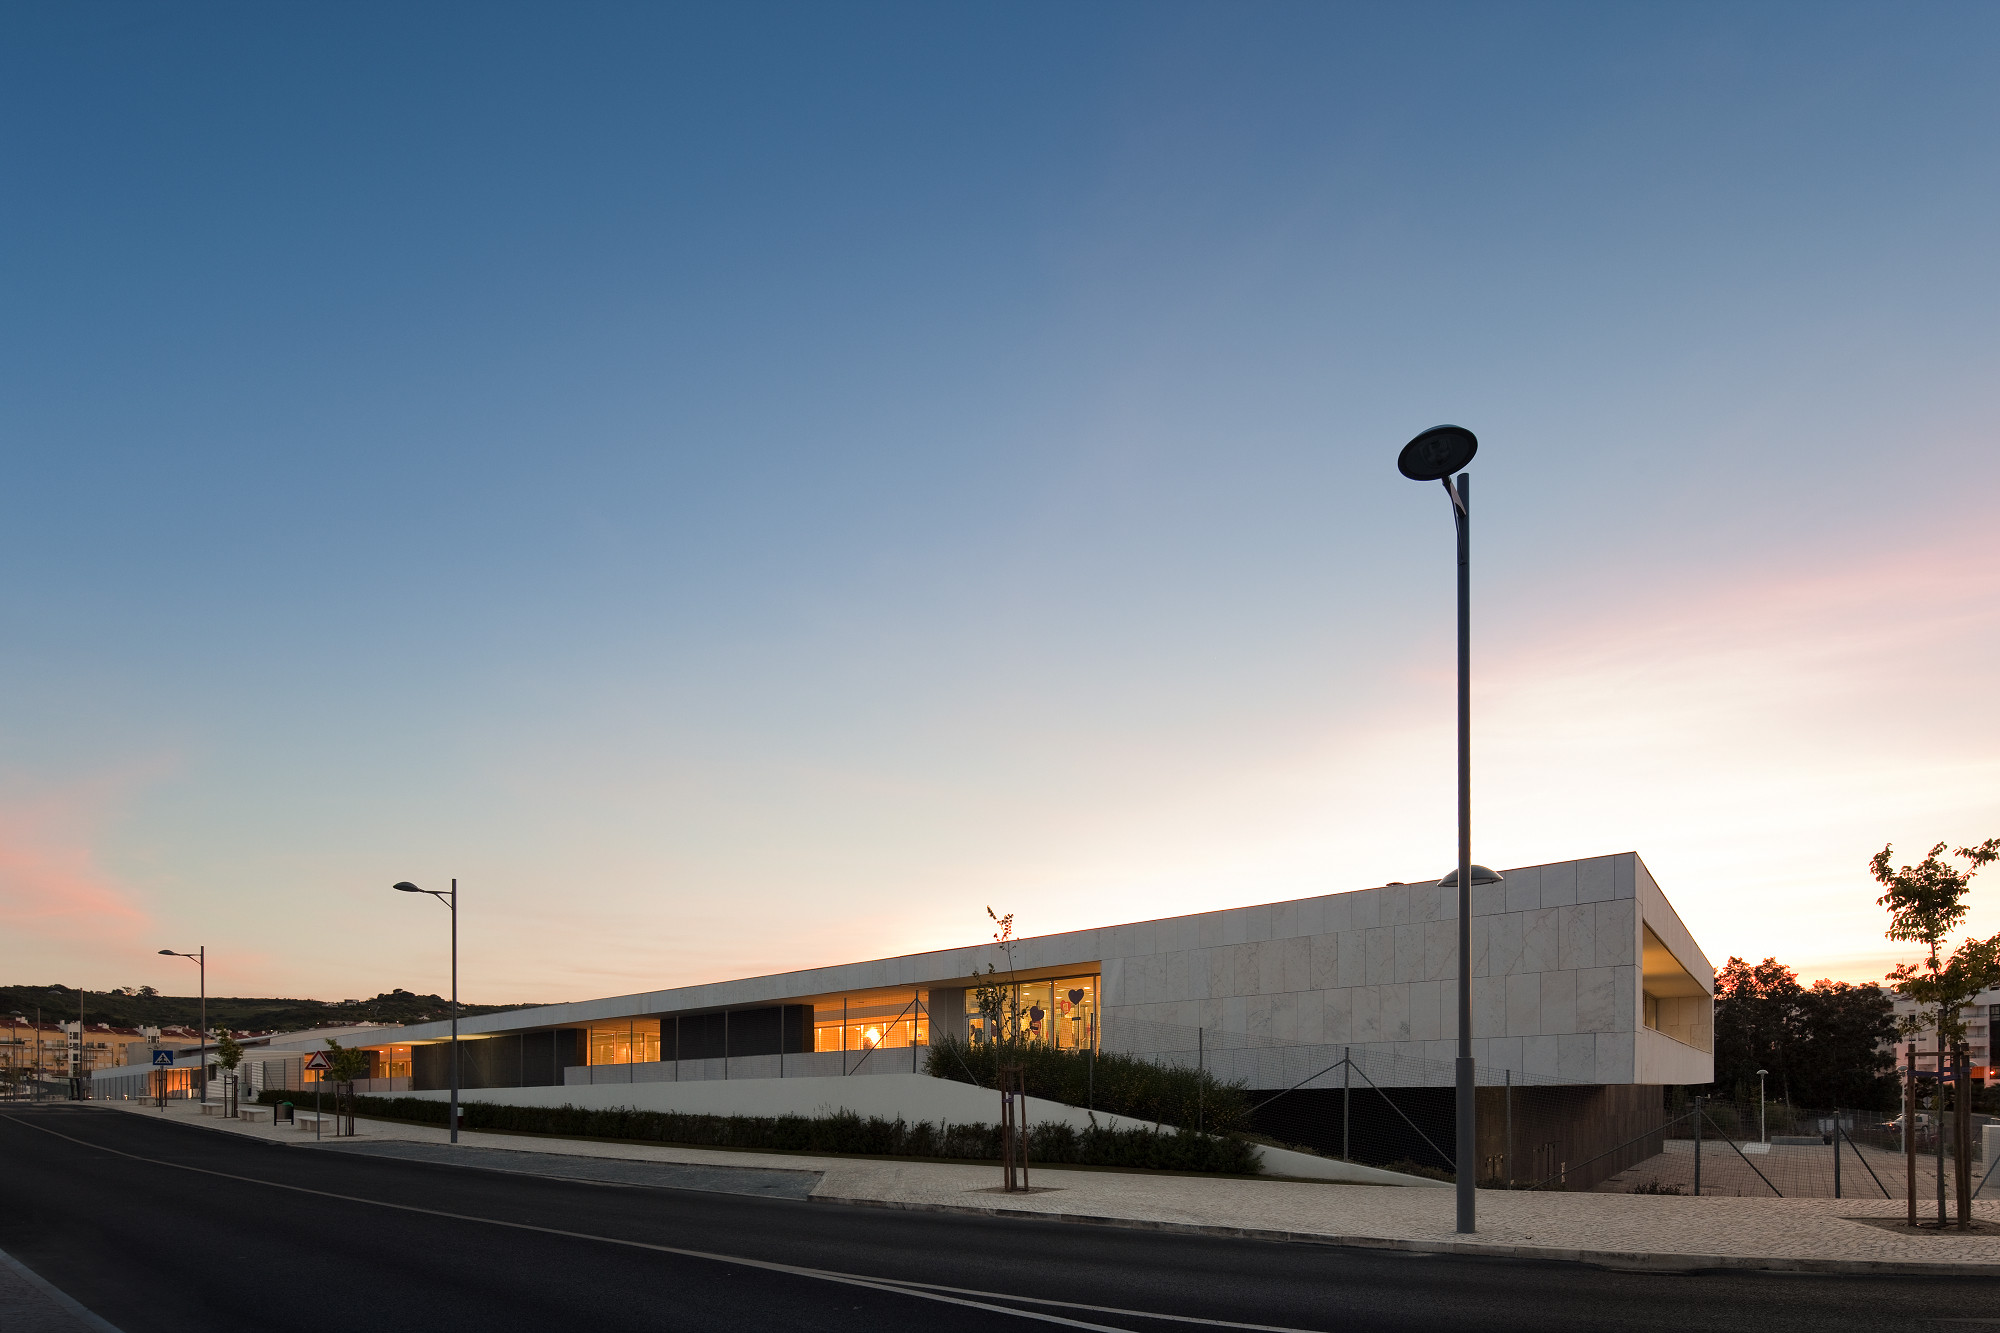 Centro educacional Paredes / André Espinho – Arquitectura, © FG+SG – Fernando Guerra, Sergio Guerra